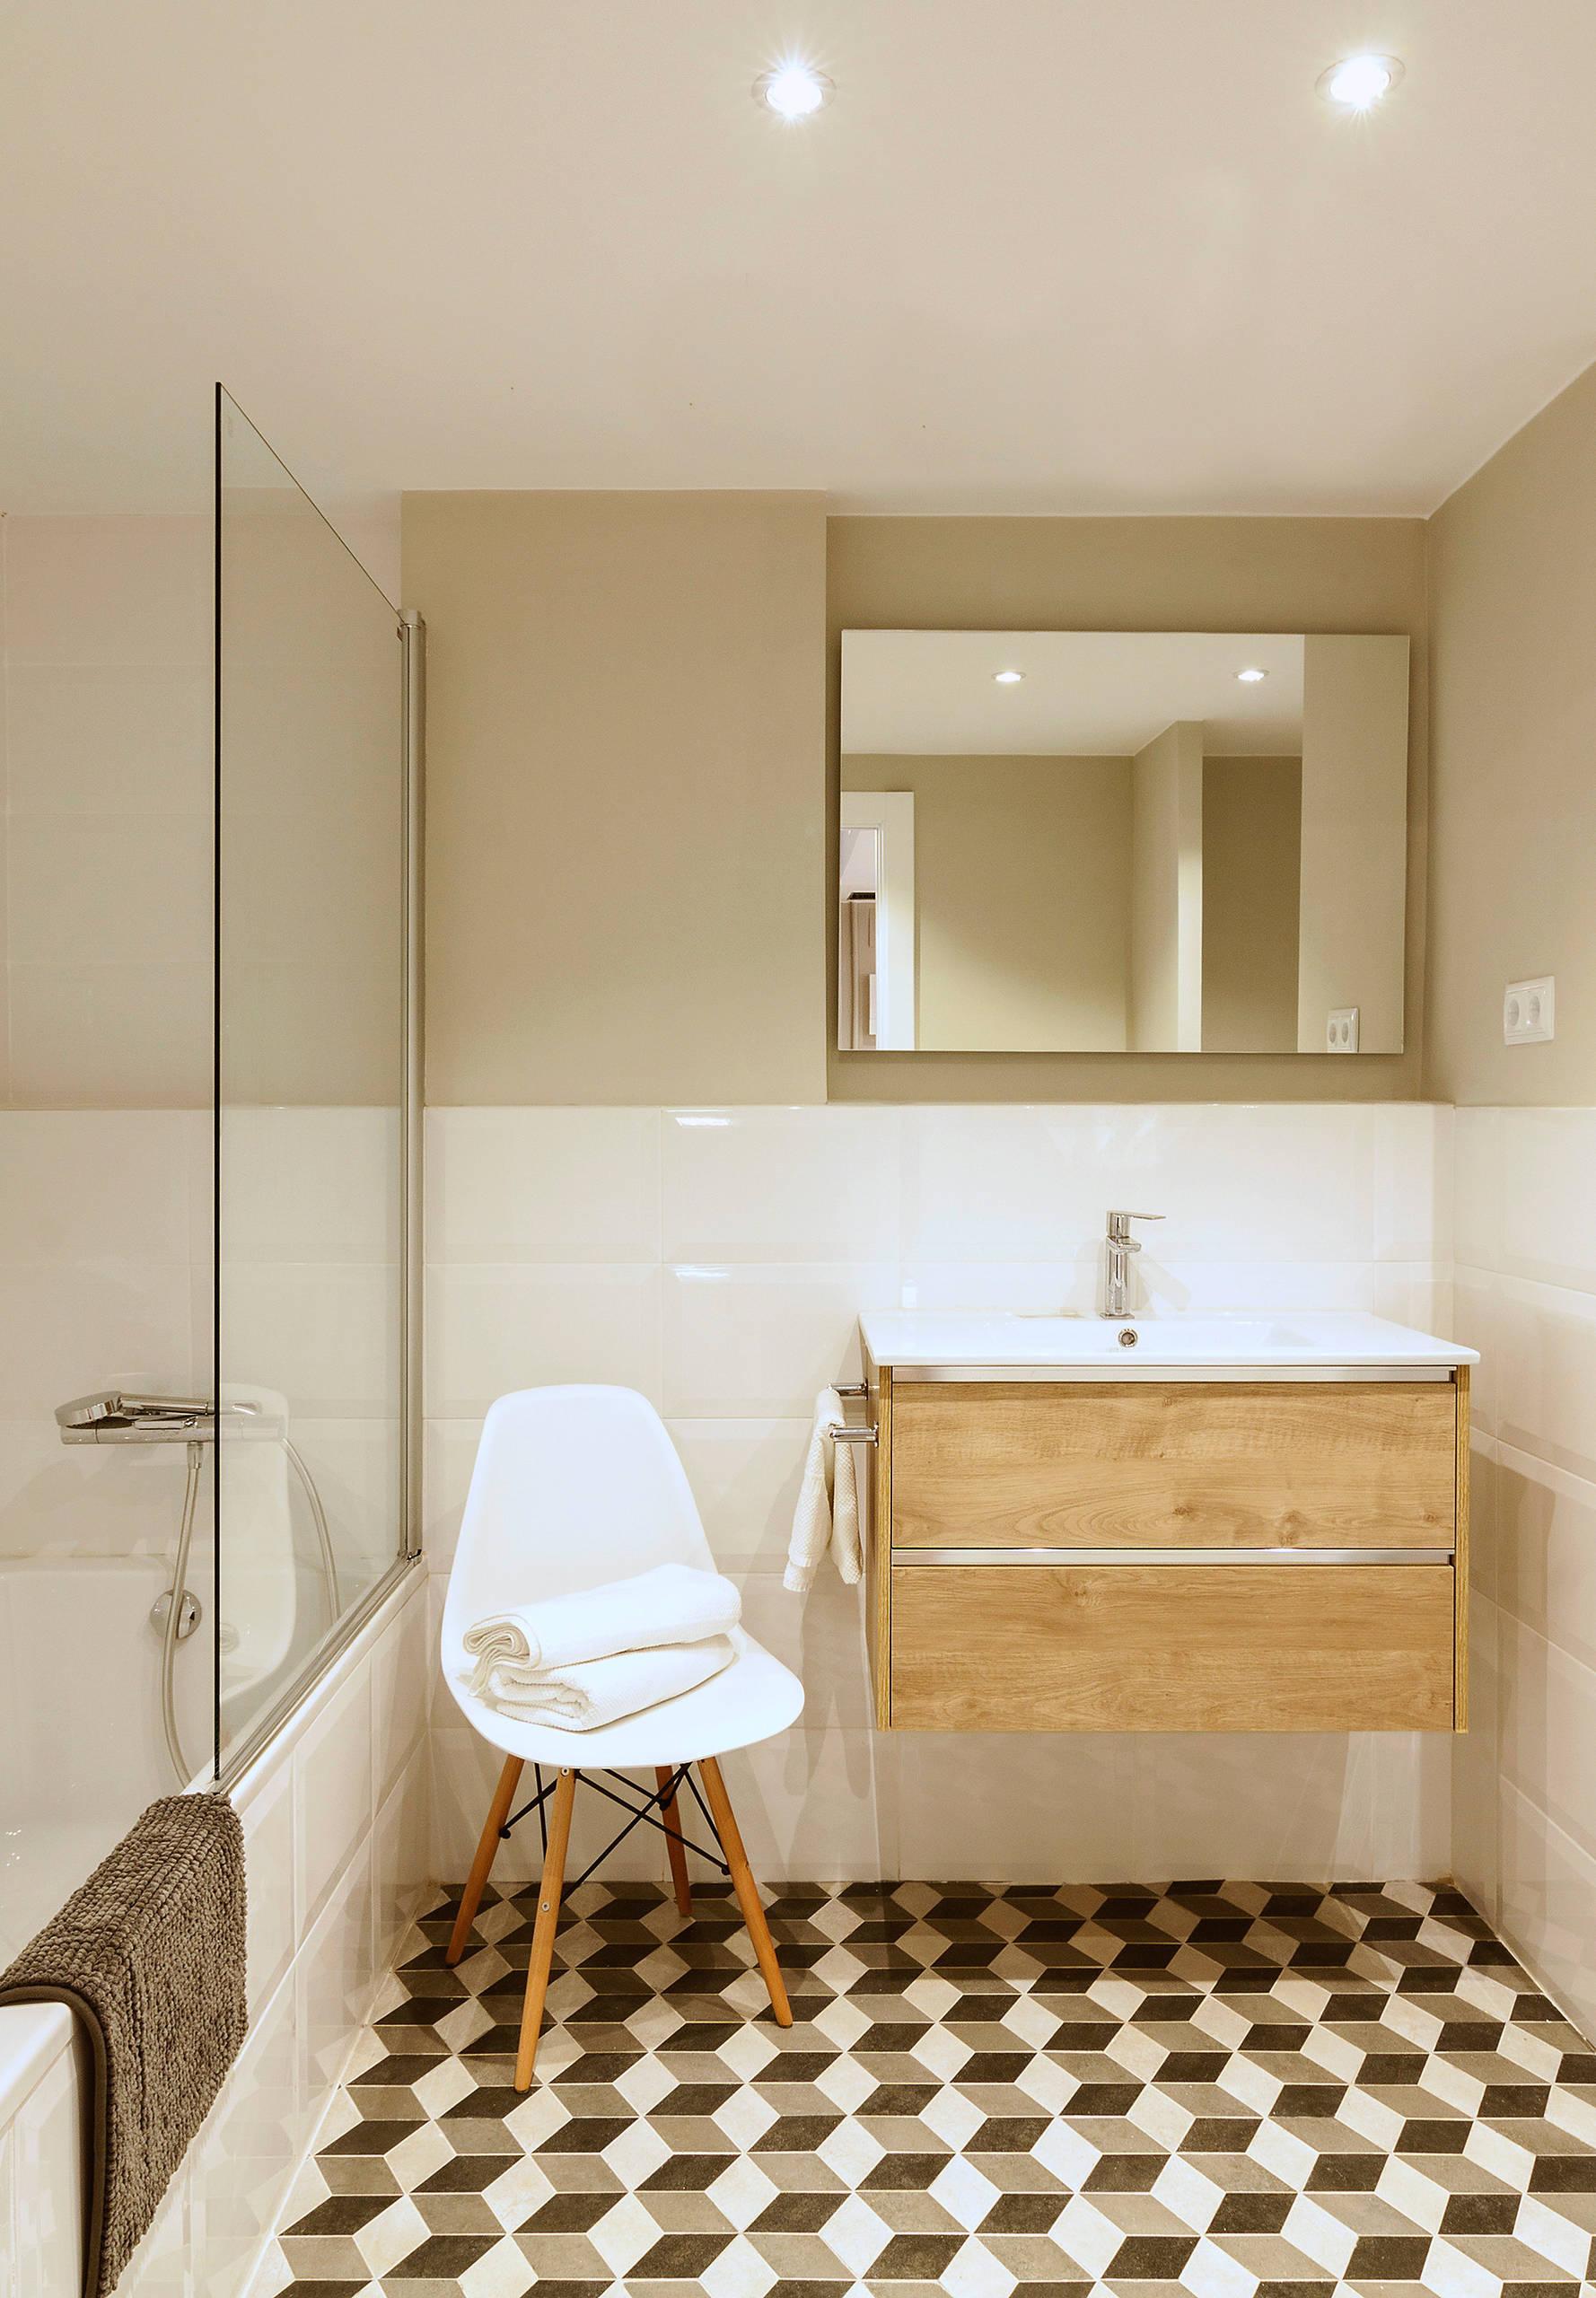 Ordinaire 15 Stunning Scandinavian Bathroom Designs Youre Going To Like